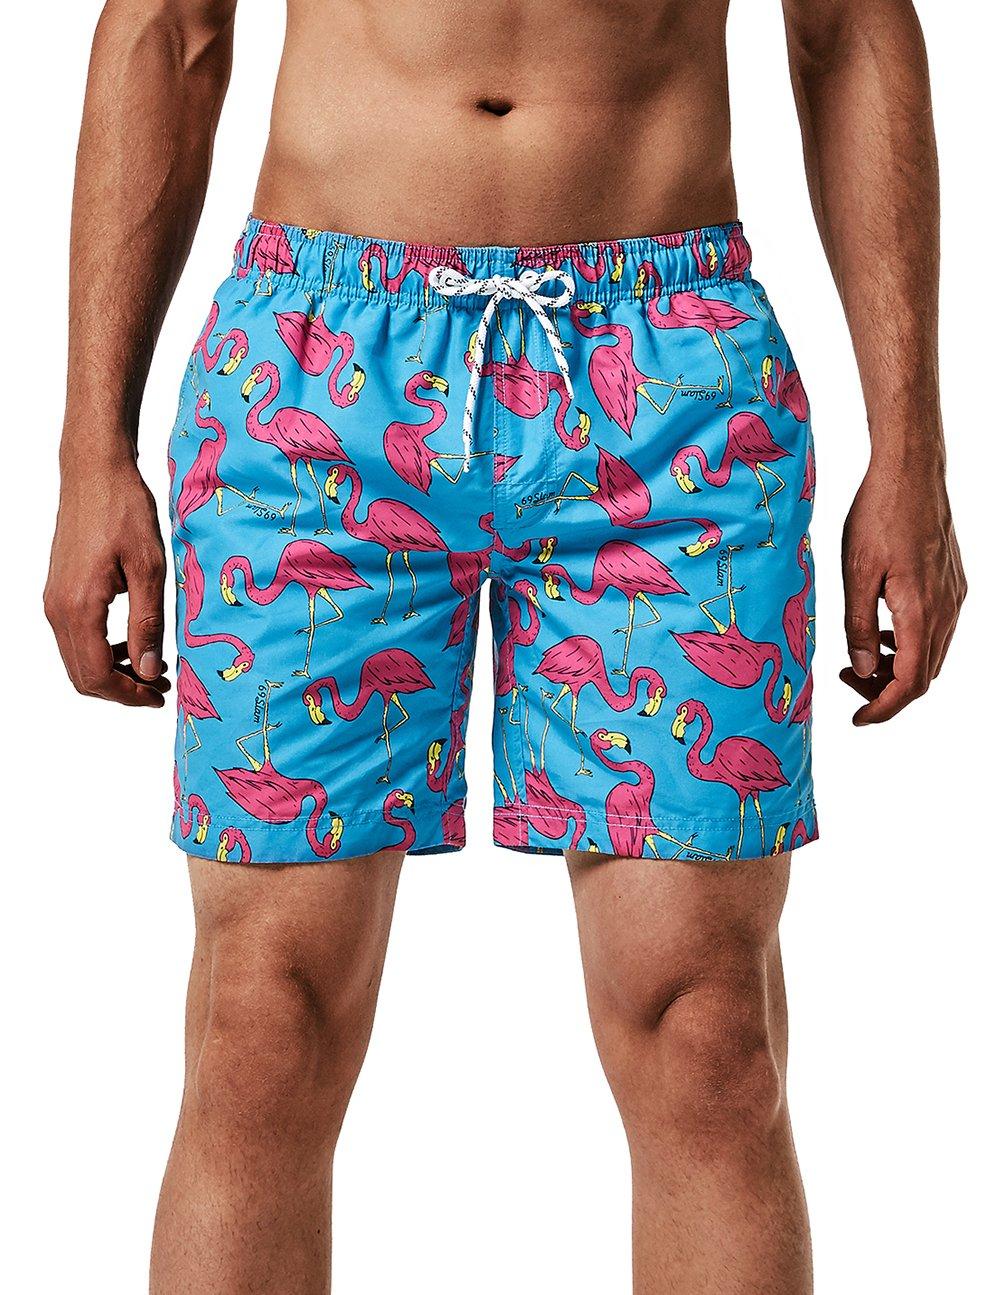 MaaMgic Uomo Costume da Bagno Nuoto Calzoncini Asciugatura Veloce per Spiaggia Mare Piscina 3 spesavip